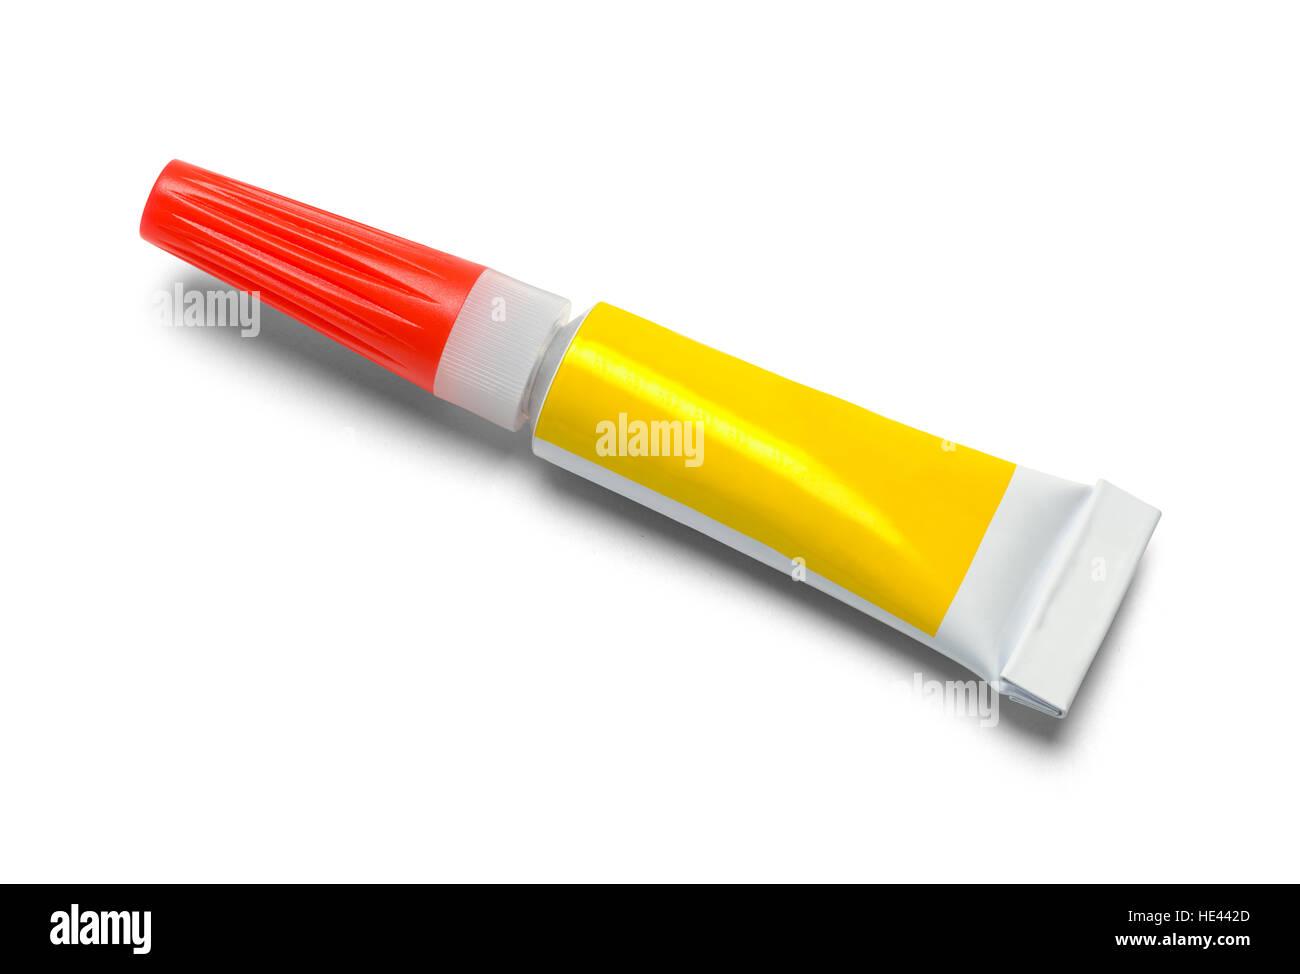 Tube of Strong Glue Isolated on White Background. - Stock Image